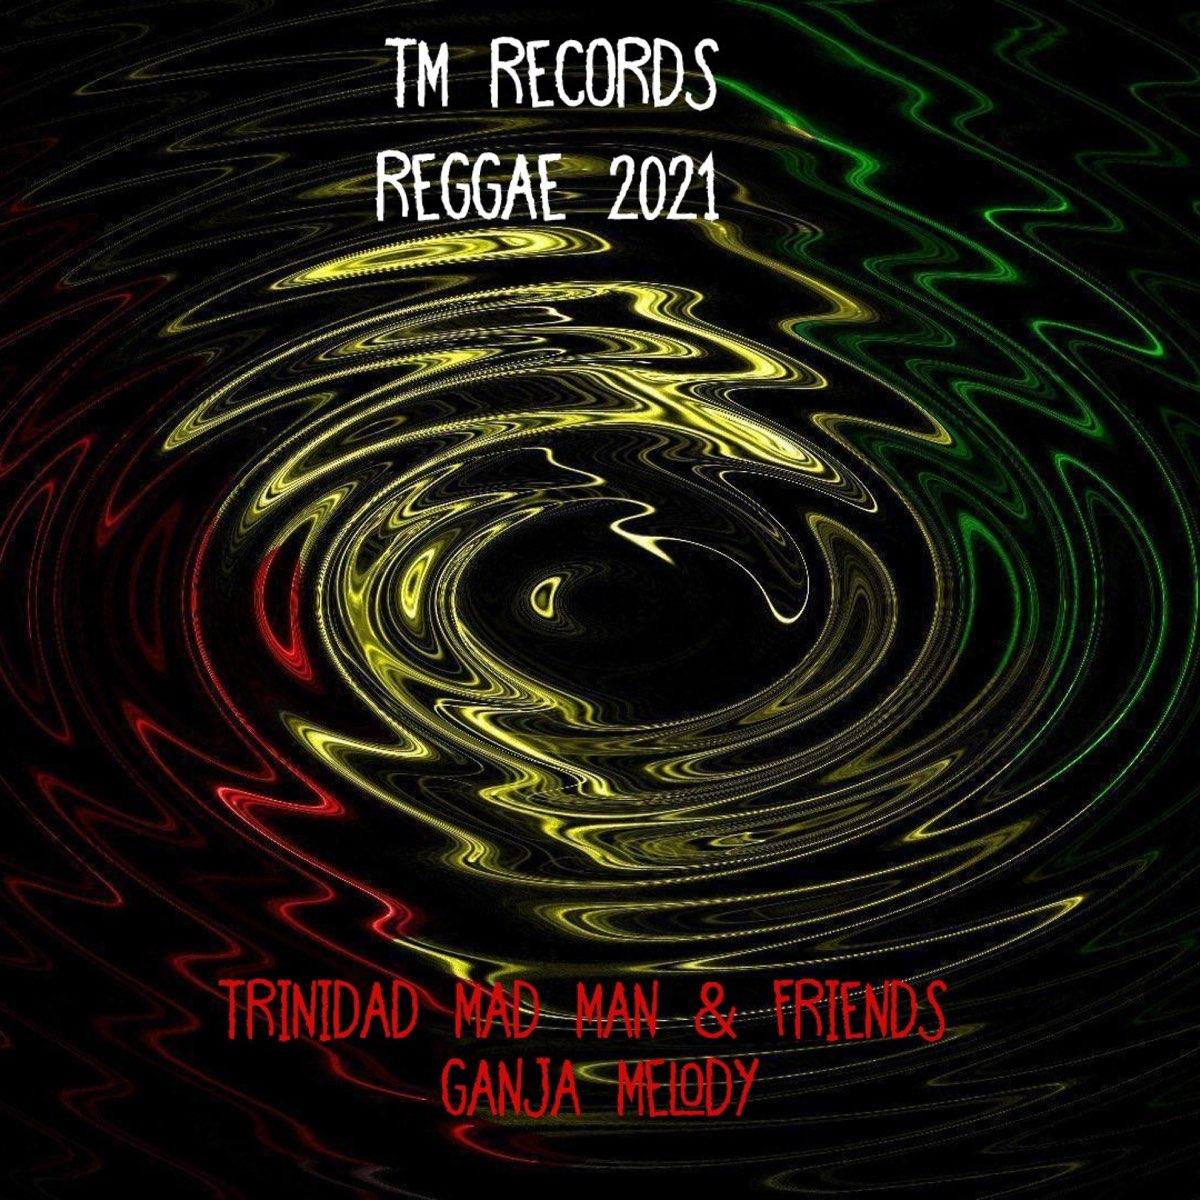 Trinidad Christmas Regga Music 2021 Ganja Melody Single By Trinidad Mad Man On Apple Music